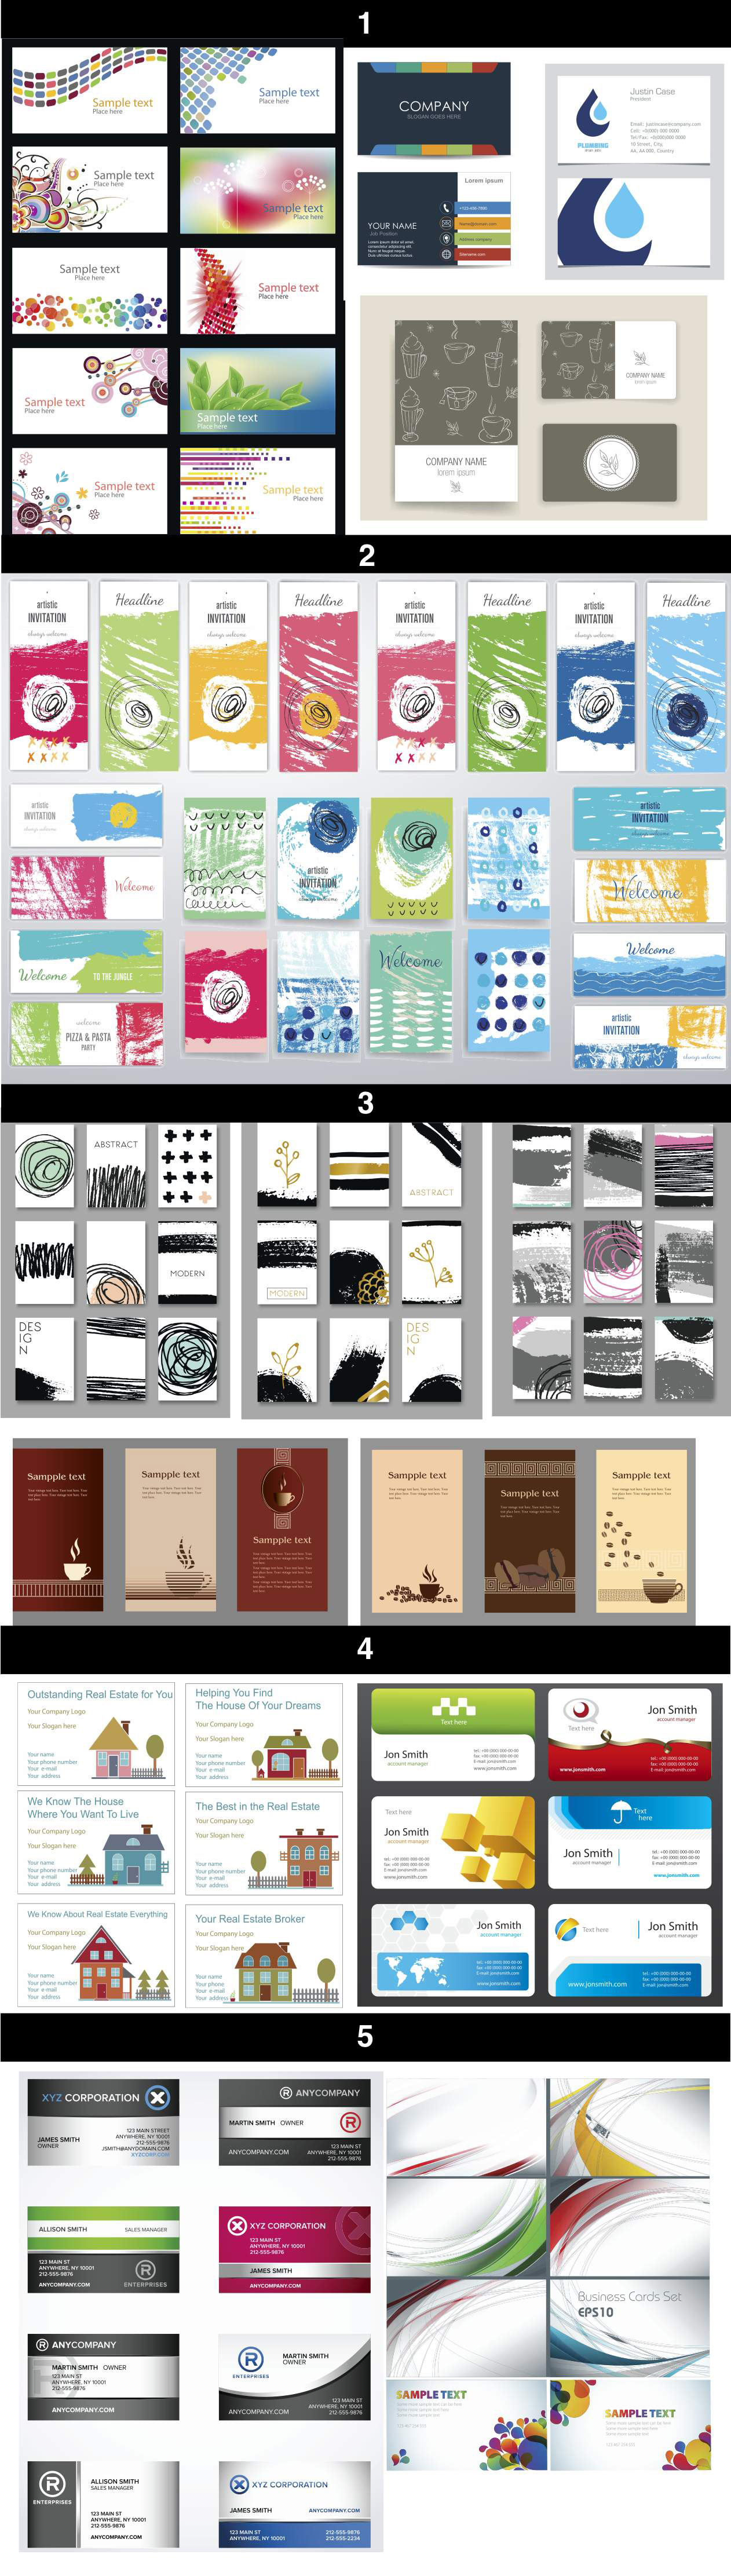 Biz card samples 2-Layout 1